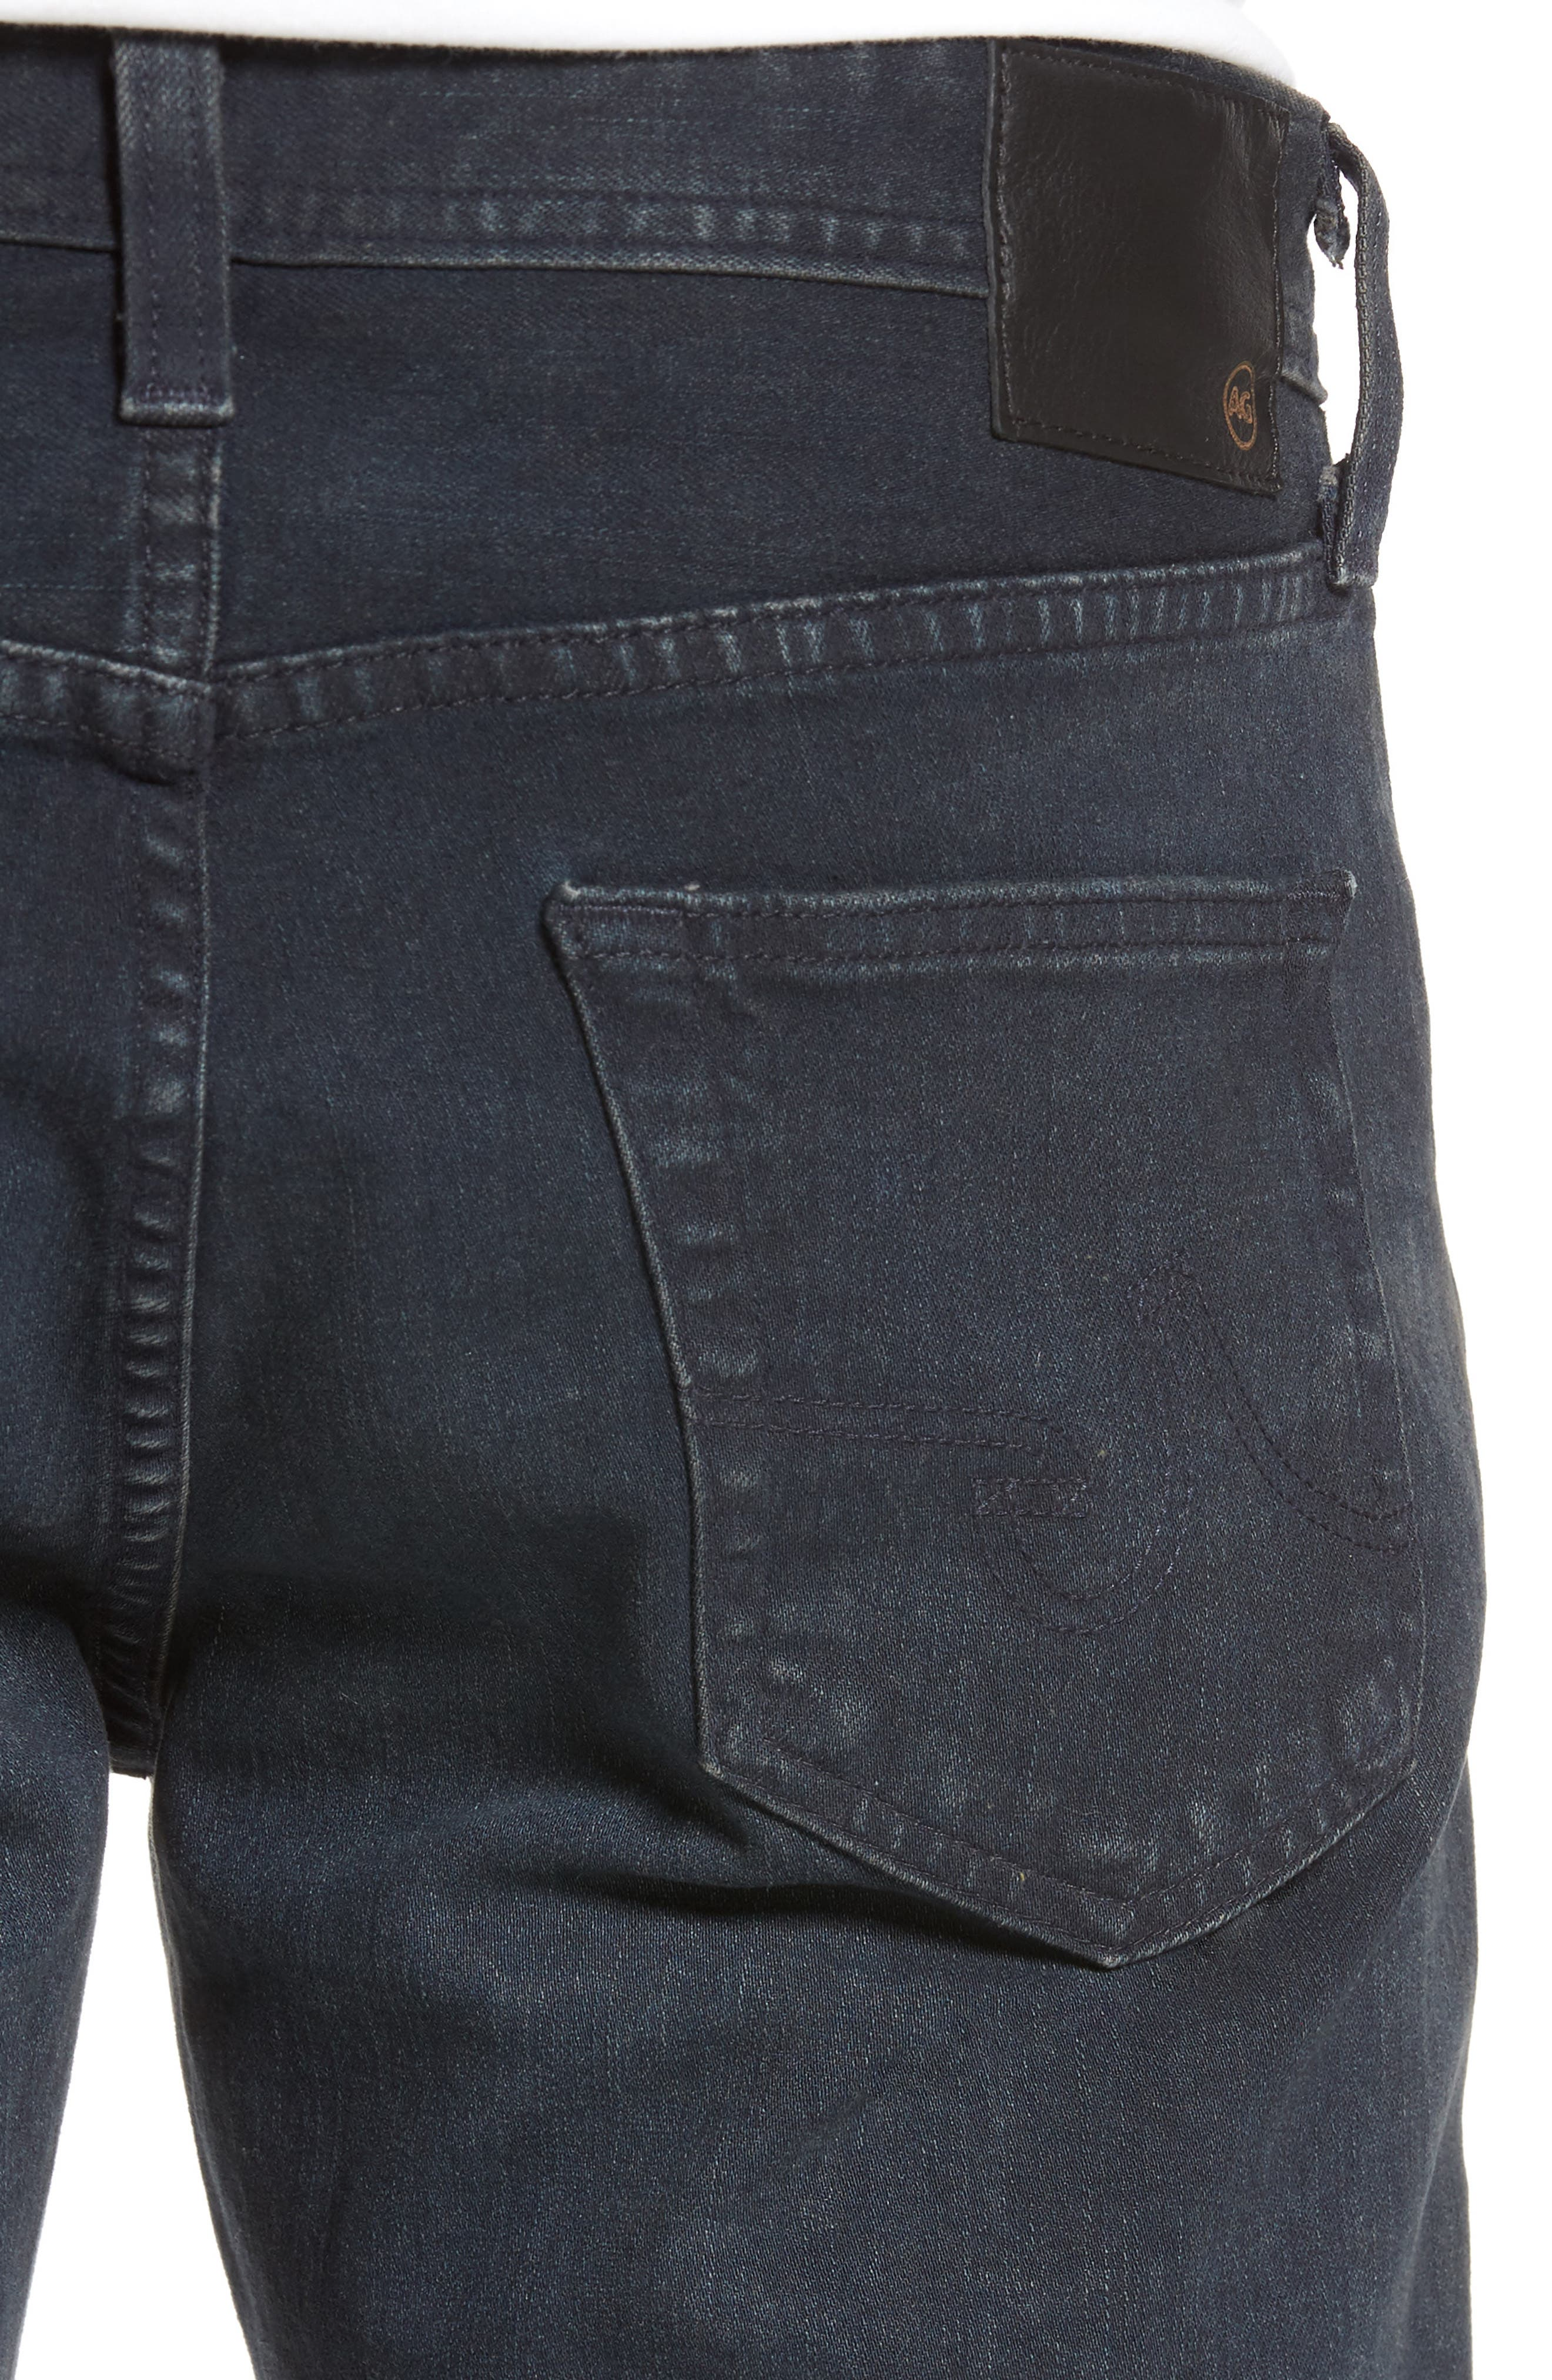 Dylan Skinny Jeans,                             Alternate thumbnail 4, color,                             019